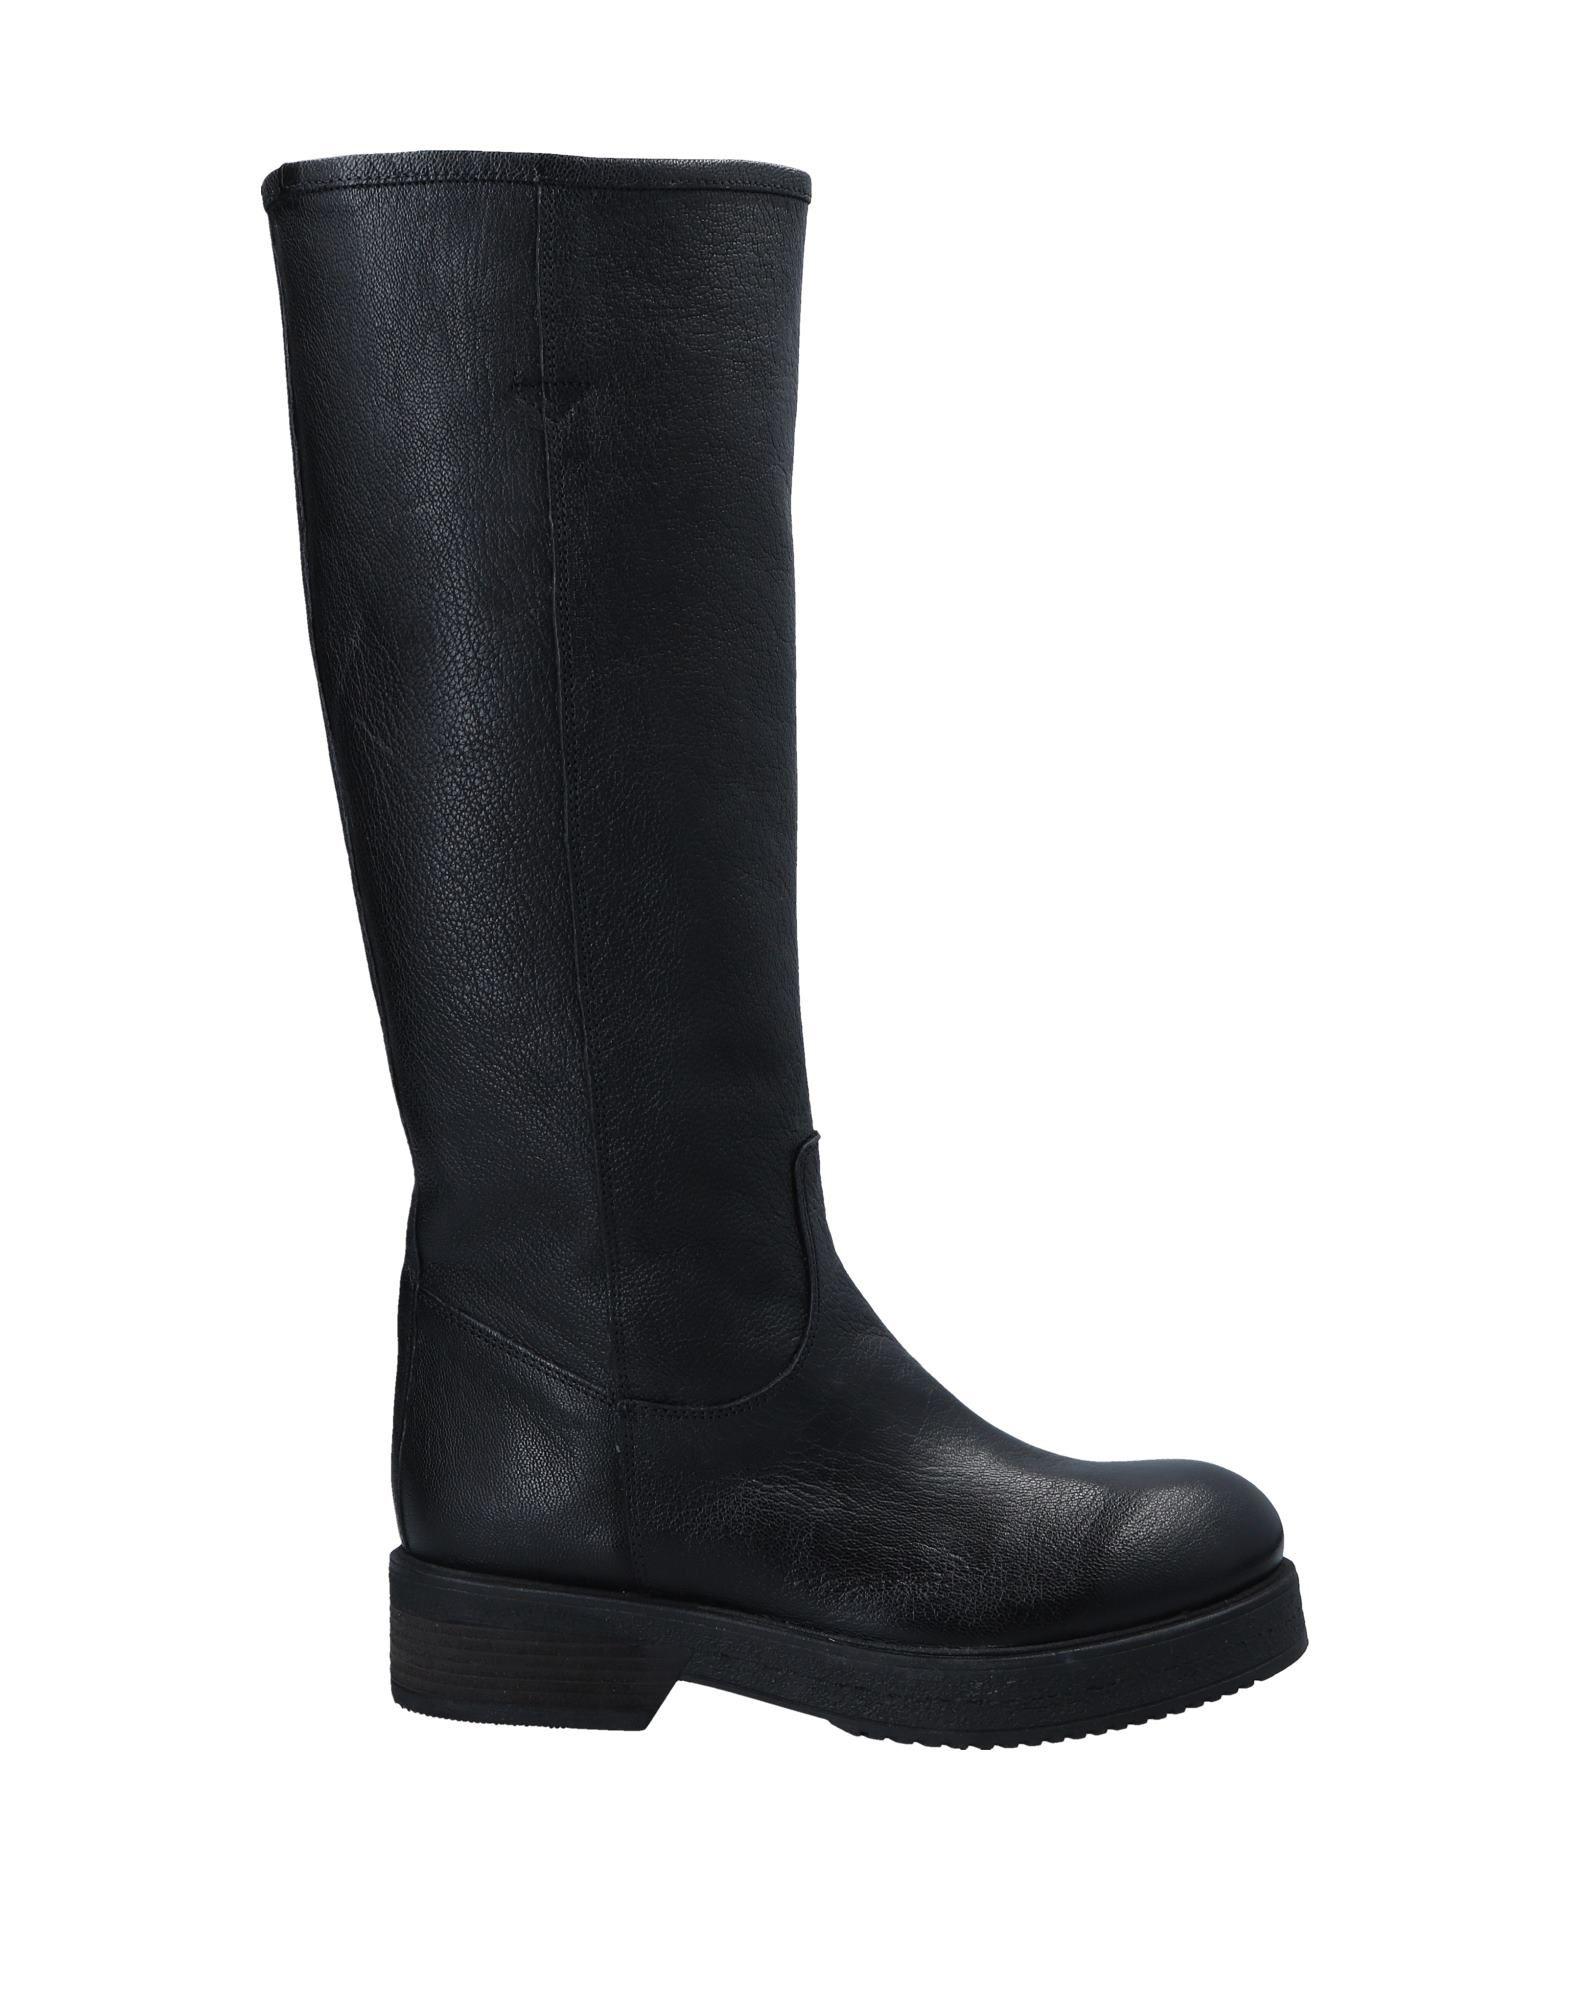 O'dan Li Boots - Women on O'dan Li Boots online on Women  United Kingdom - 11545537MB 2da1d6